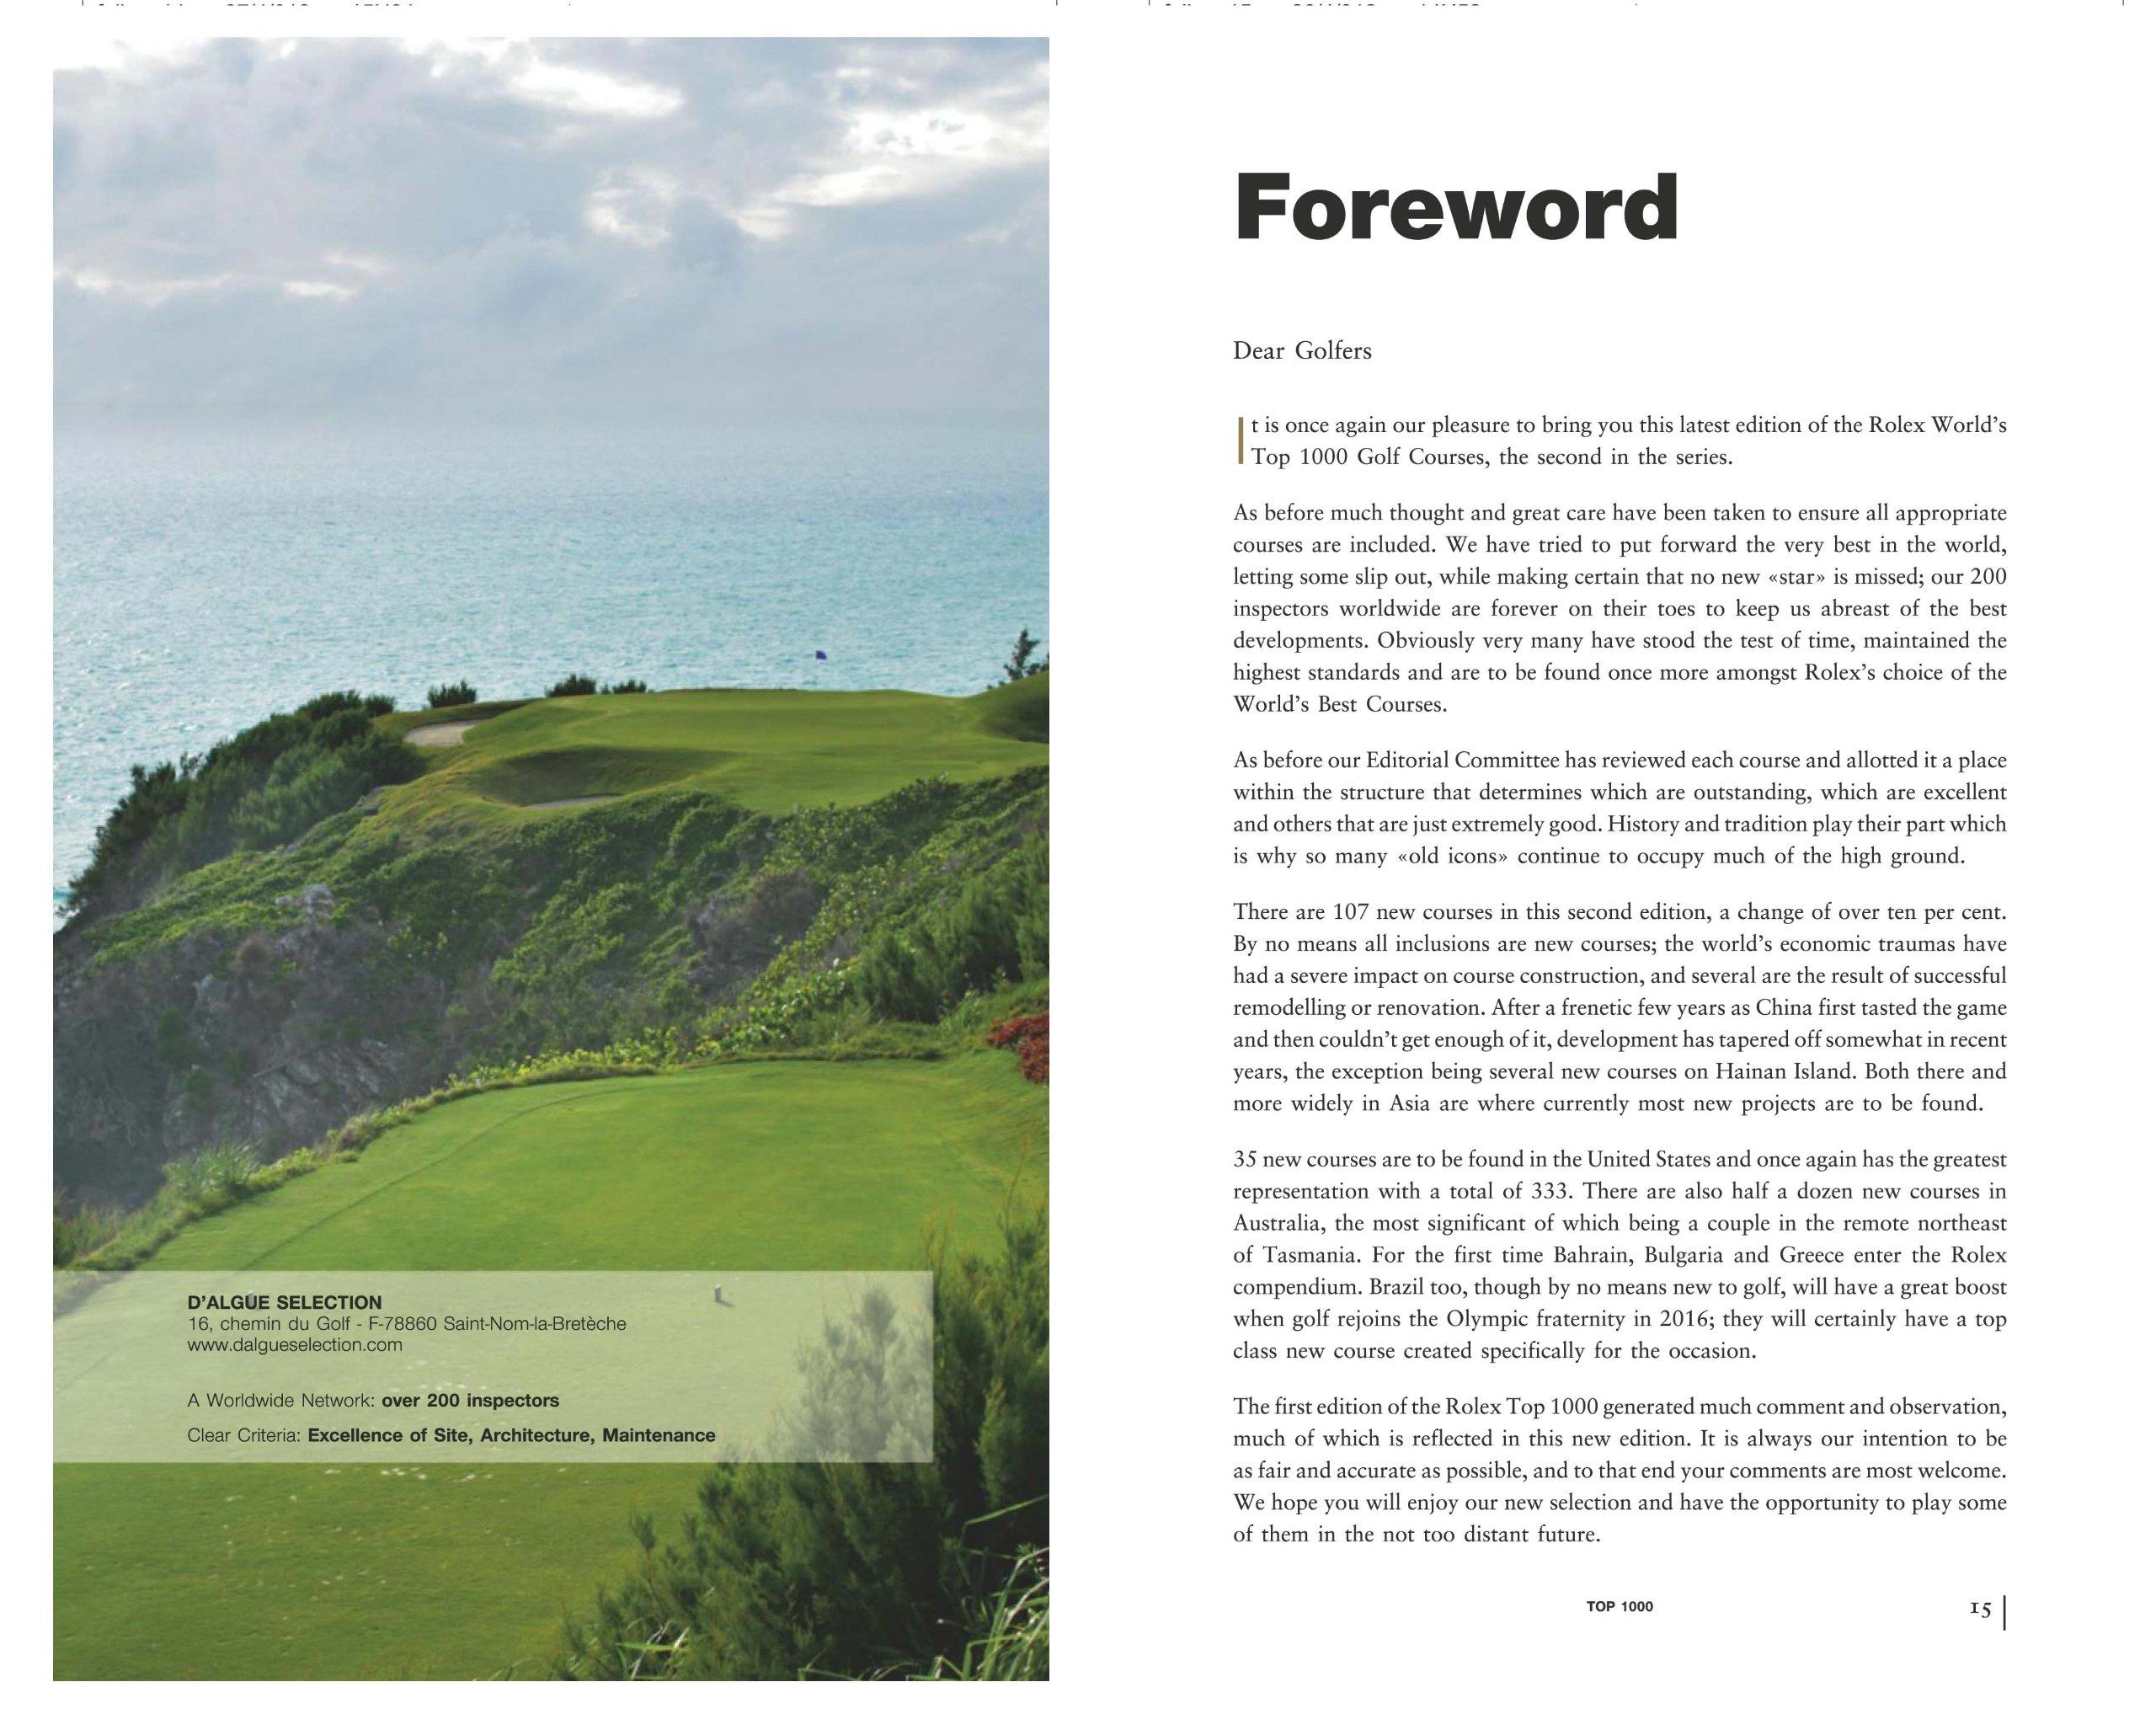 the rolex world u0027s top 1000 golf courses second edition gaetan